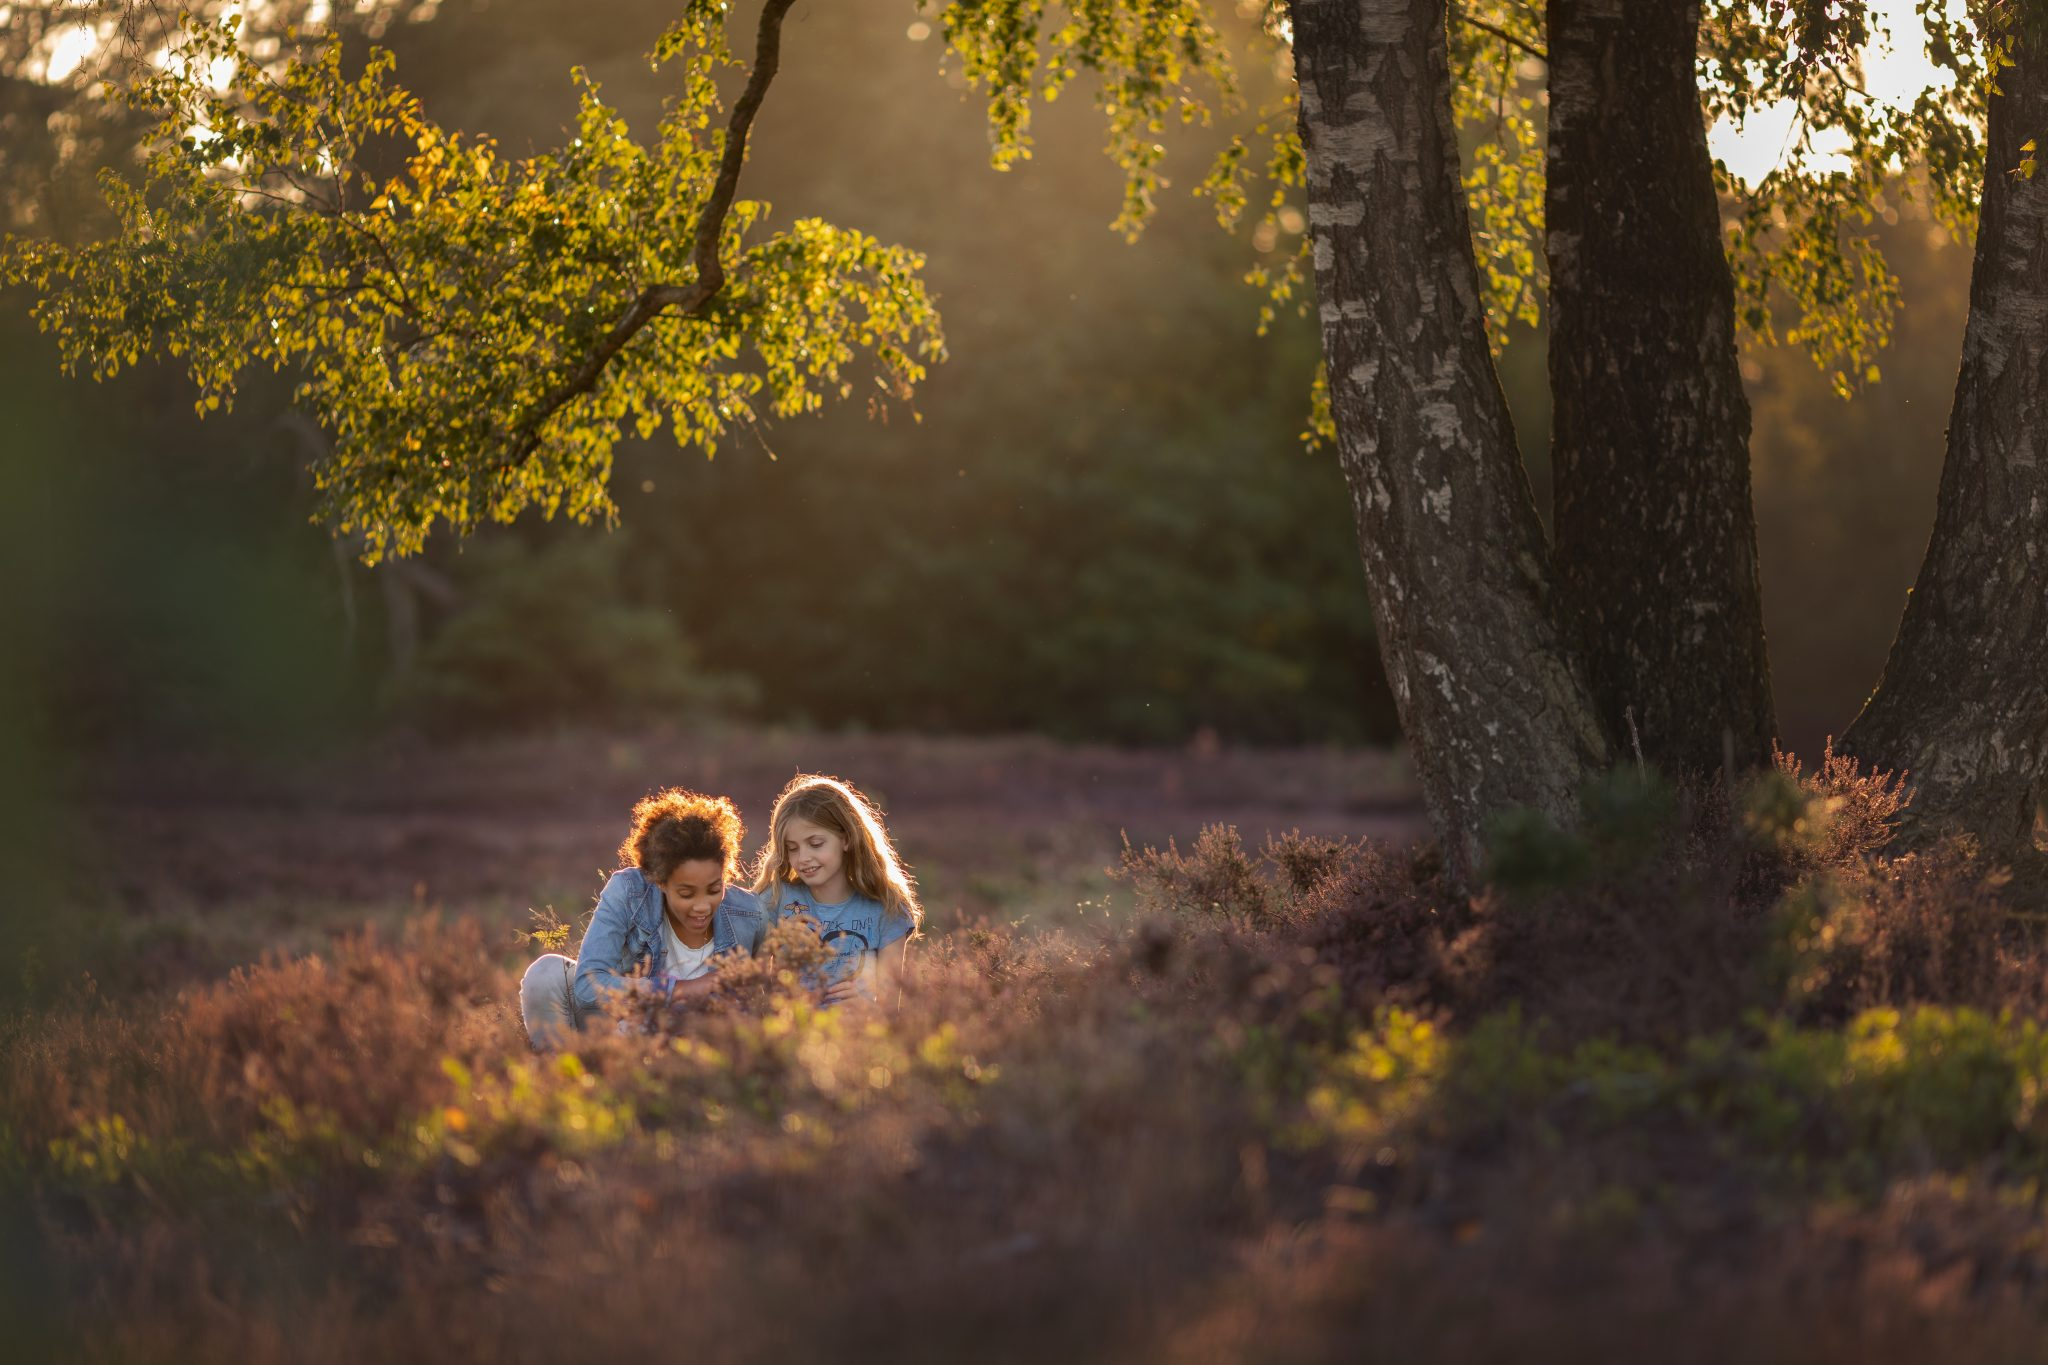 Familie fotograaf | Fotografie Lelystad & Veluwe | Familie | Fotoshoot op de heide Elspeet